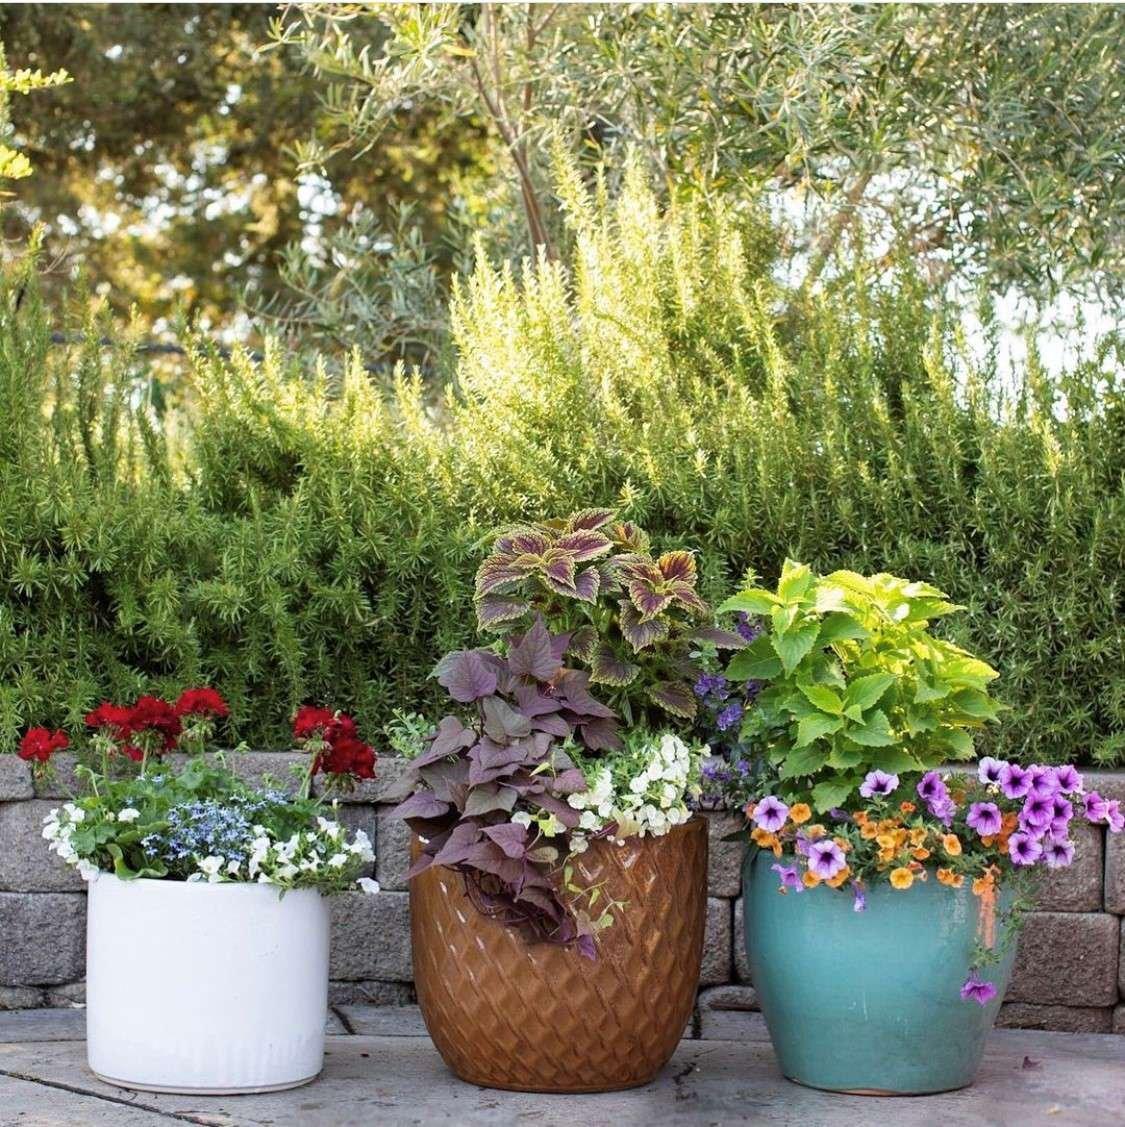 Porch Pots display